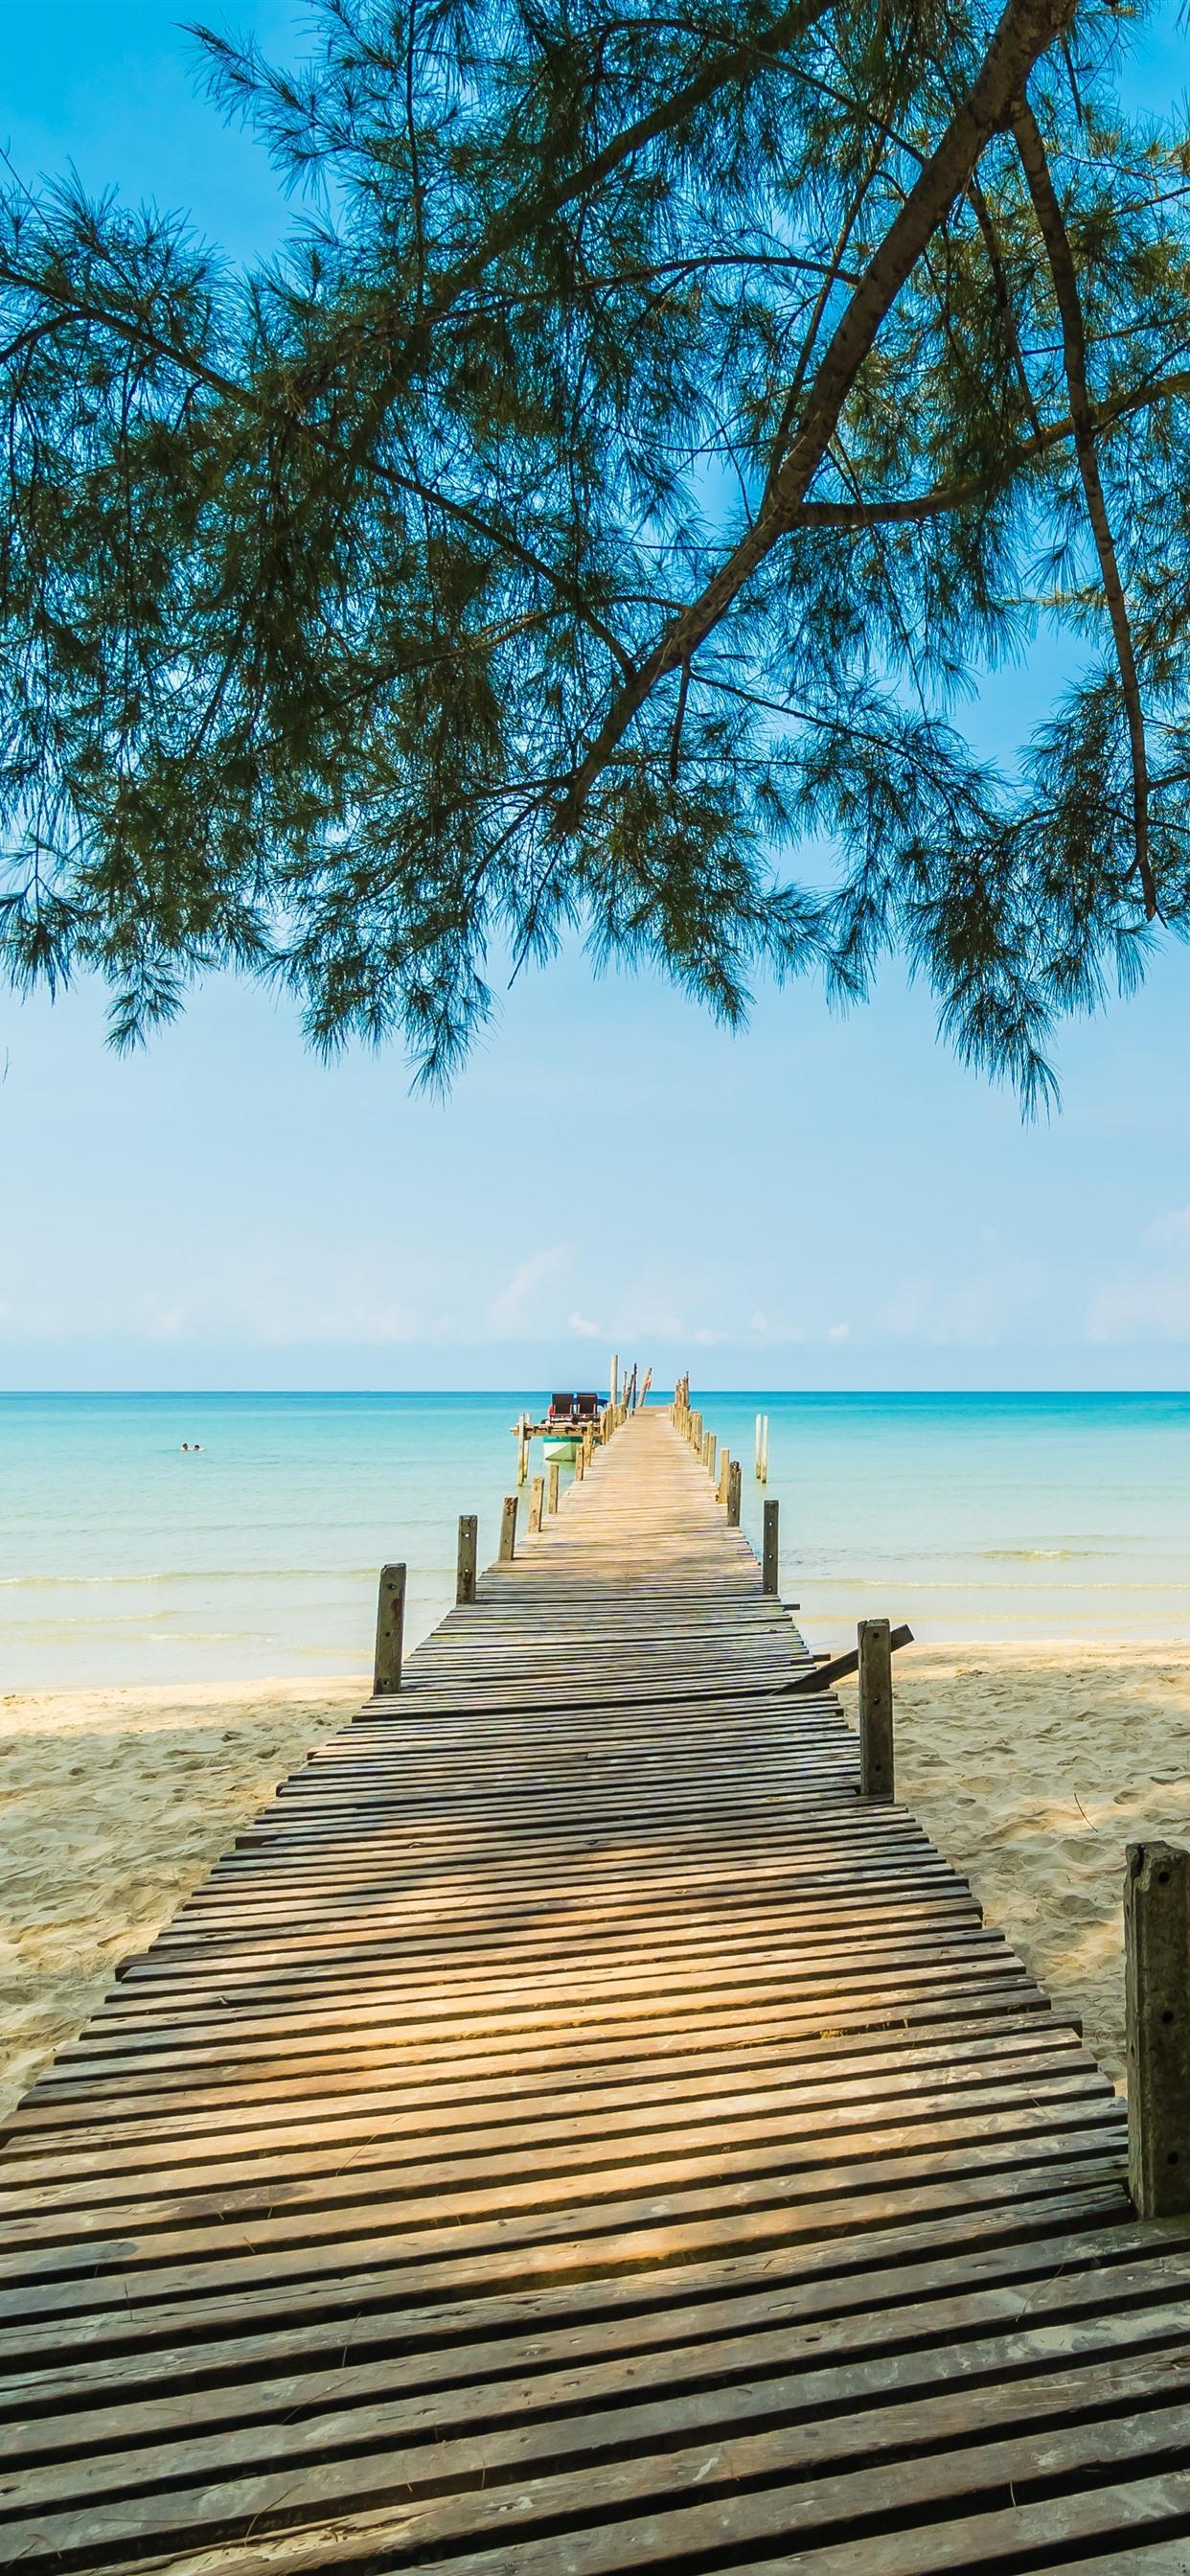 Beach Sands Pier Trees Sea Tropical 1242x2688 Iphone Xs